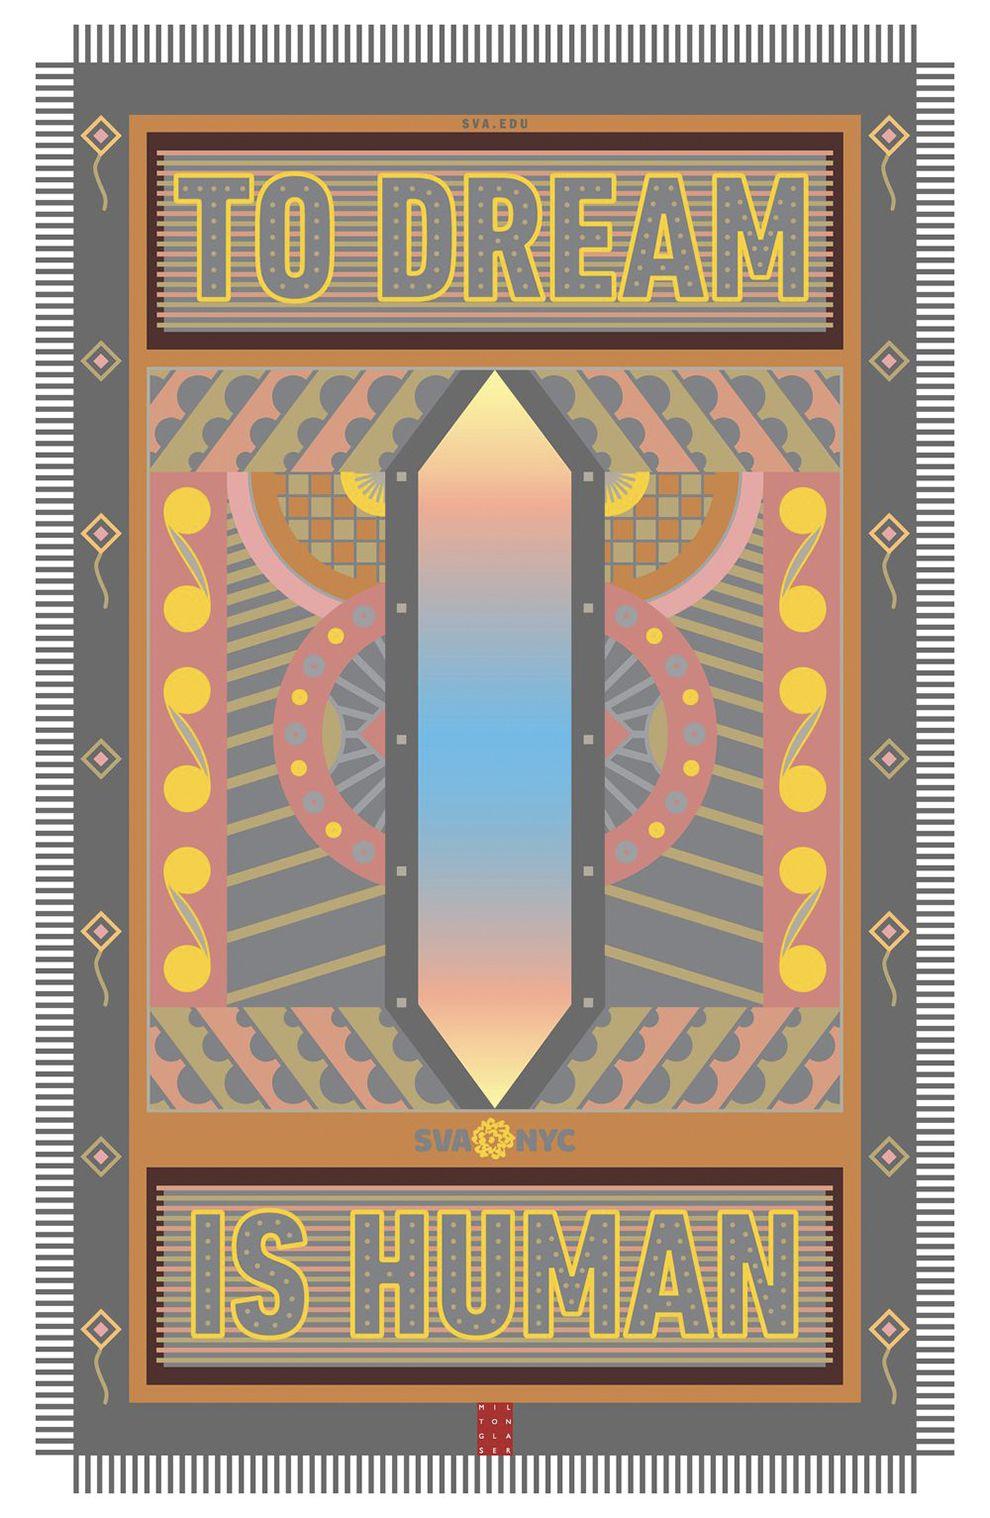 Milton Glaser's Underground Images Symmetrical Print Design